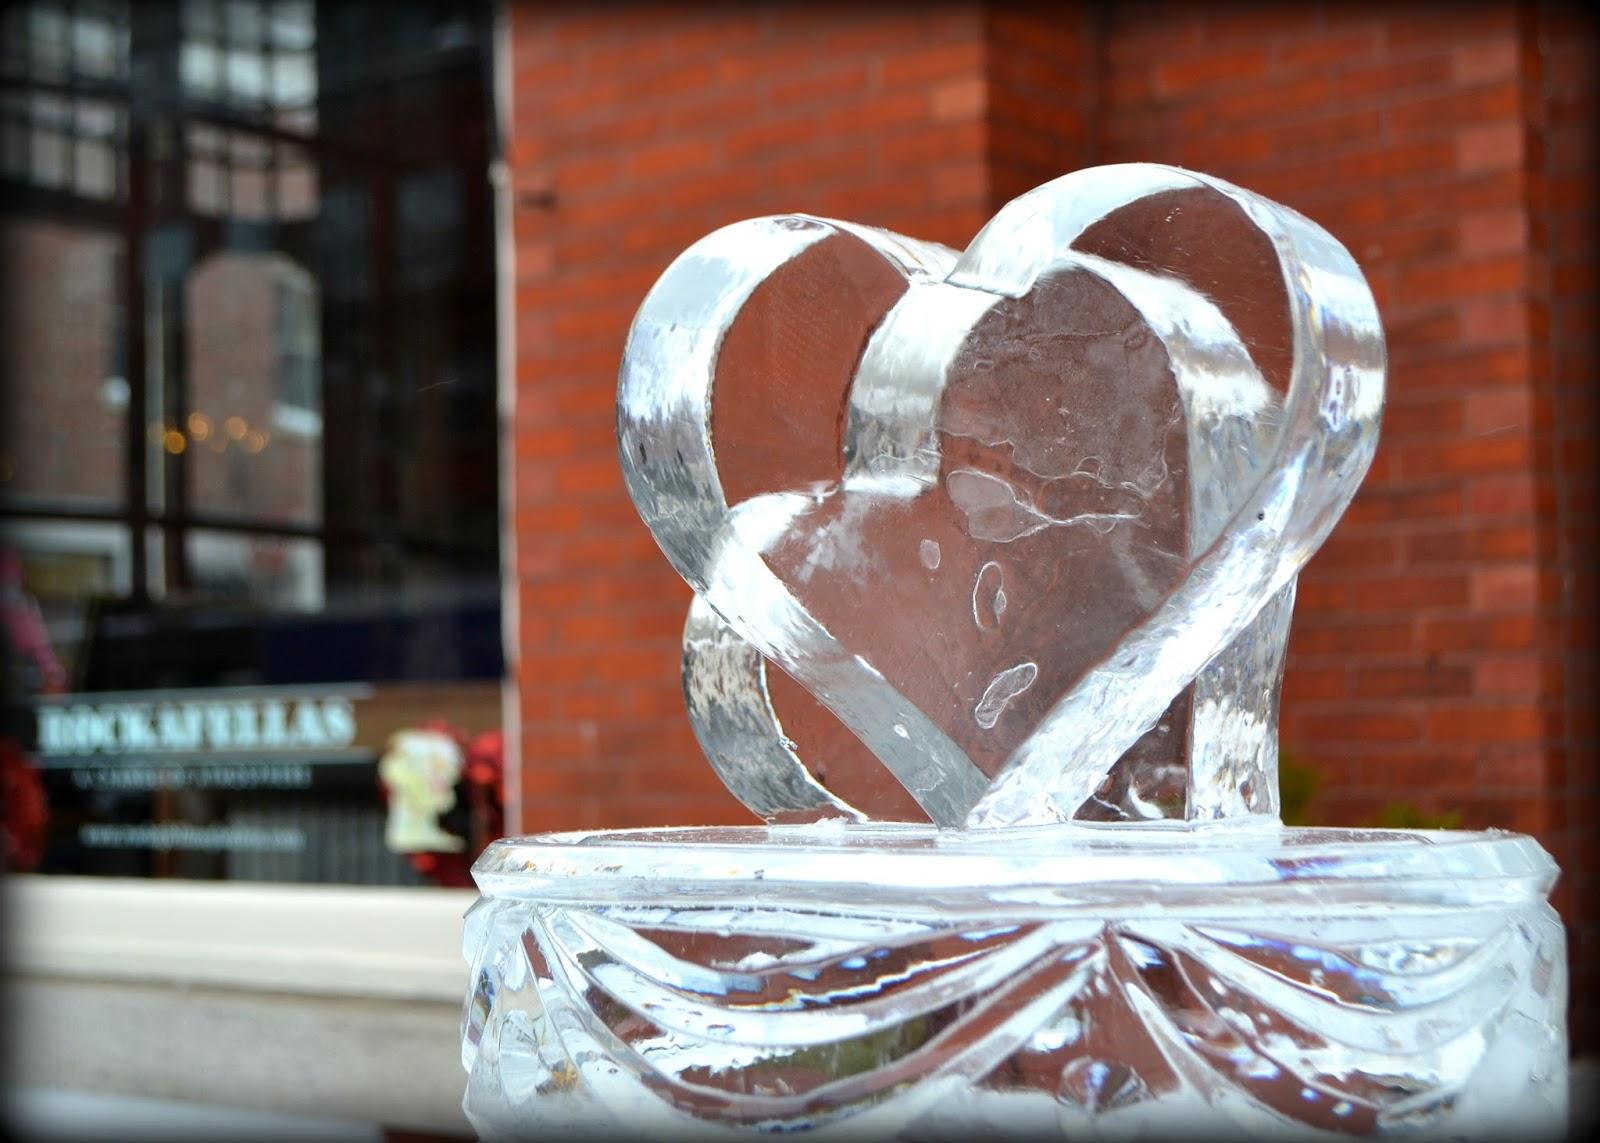 cold, heart, ice, sculpture, ice sculpture, frozen, winterfest, salem, Salem  Massachusetts,